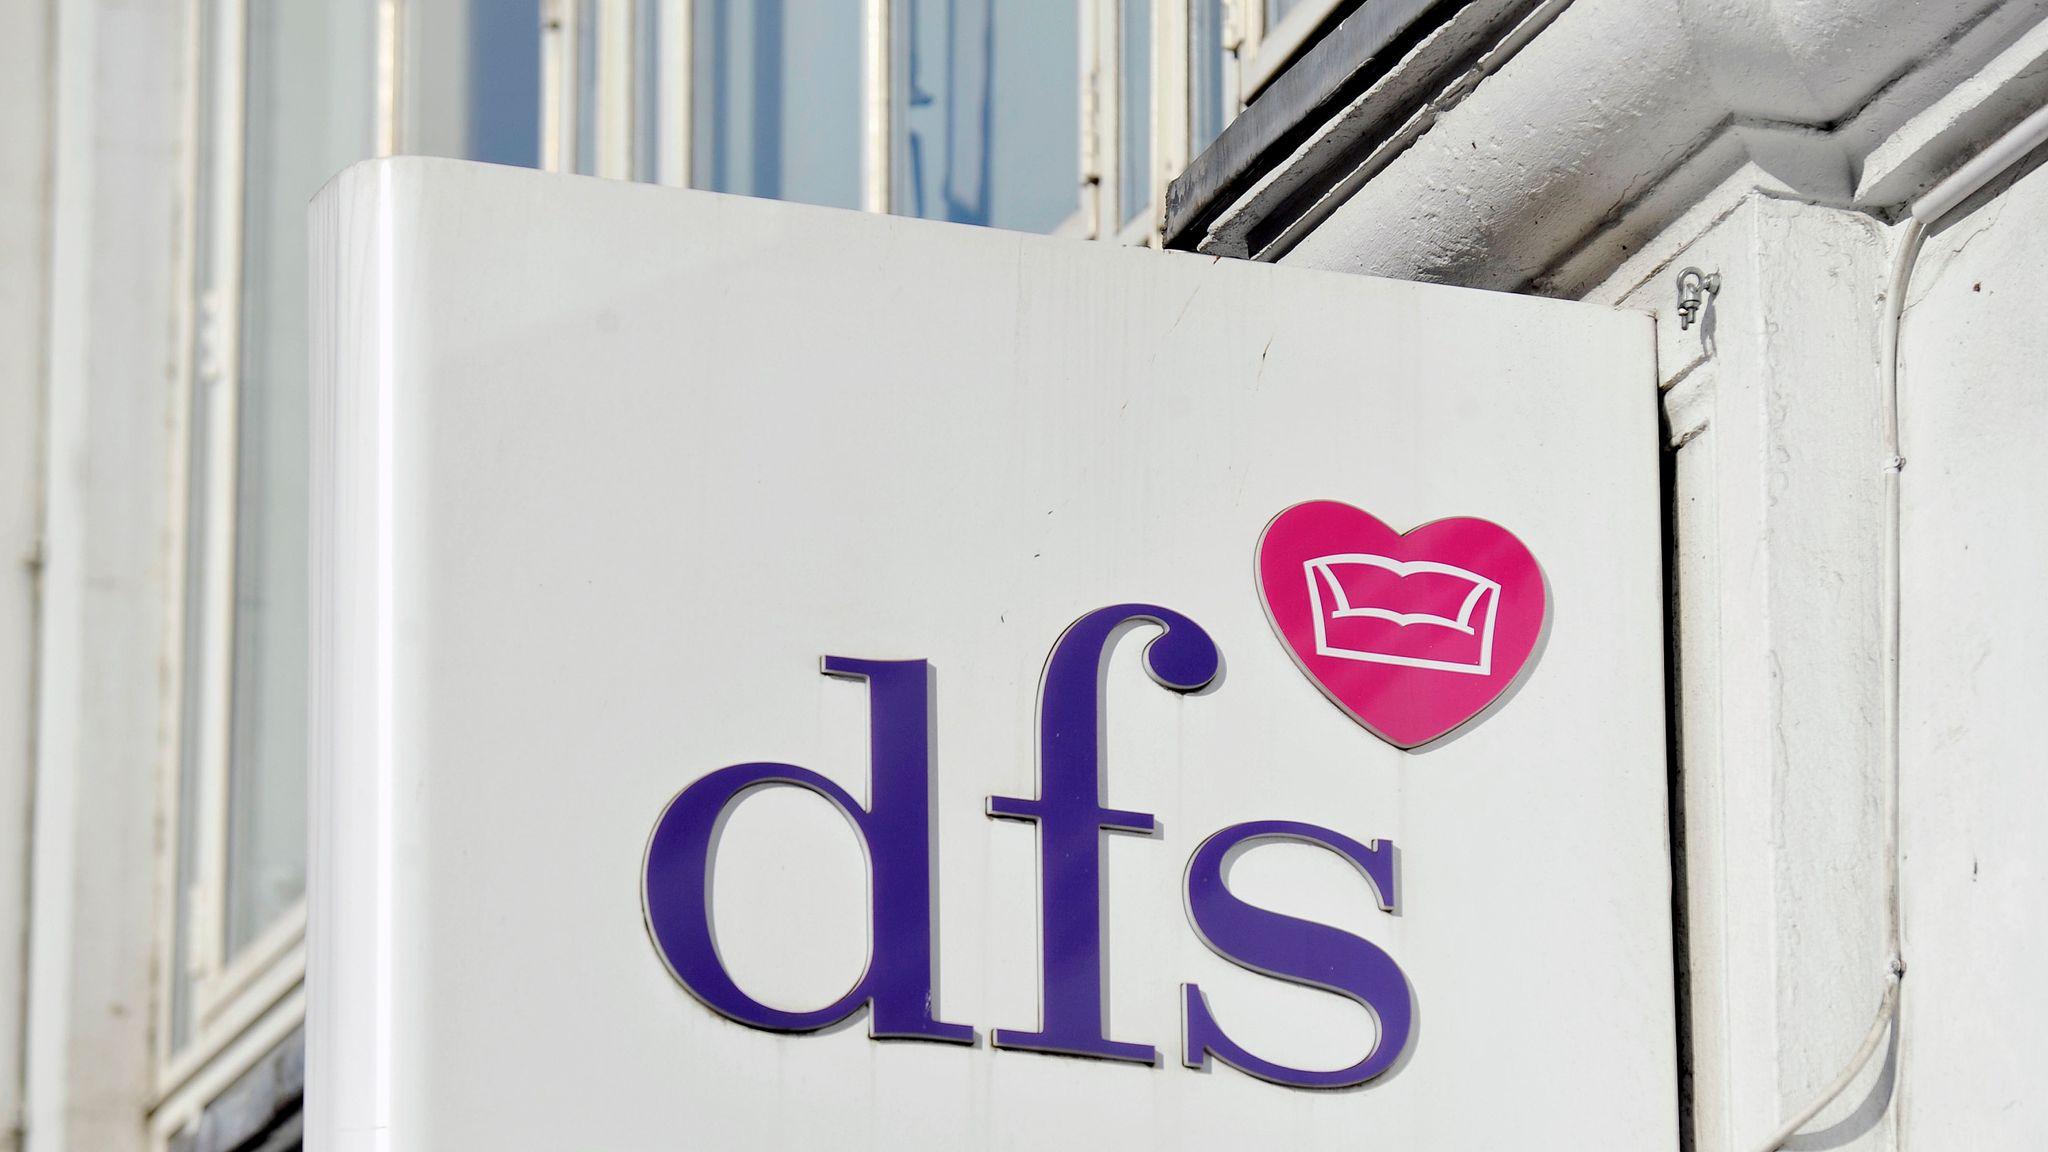 50% off DFS profits after summer sales hit